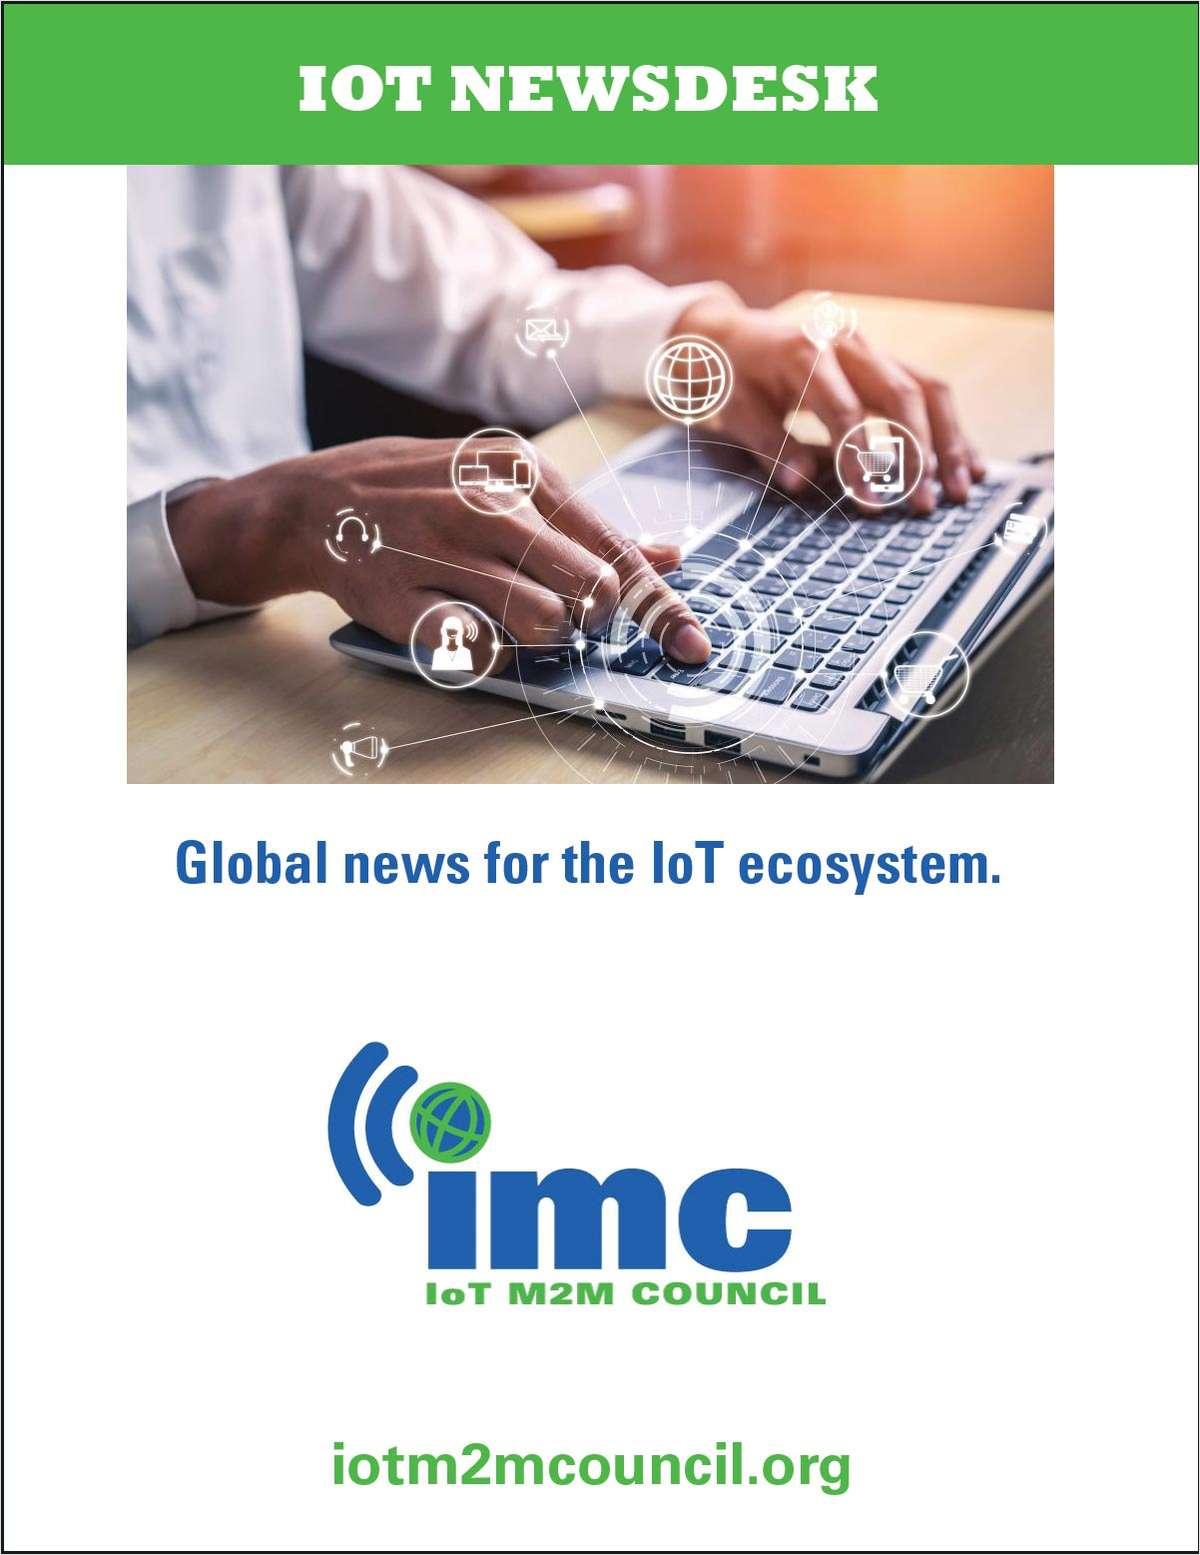 IoT Newsdesk